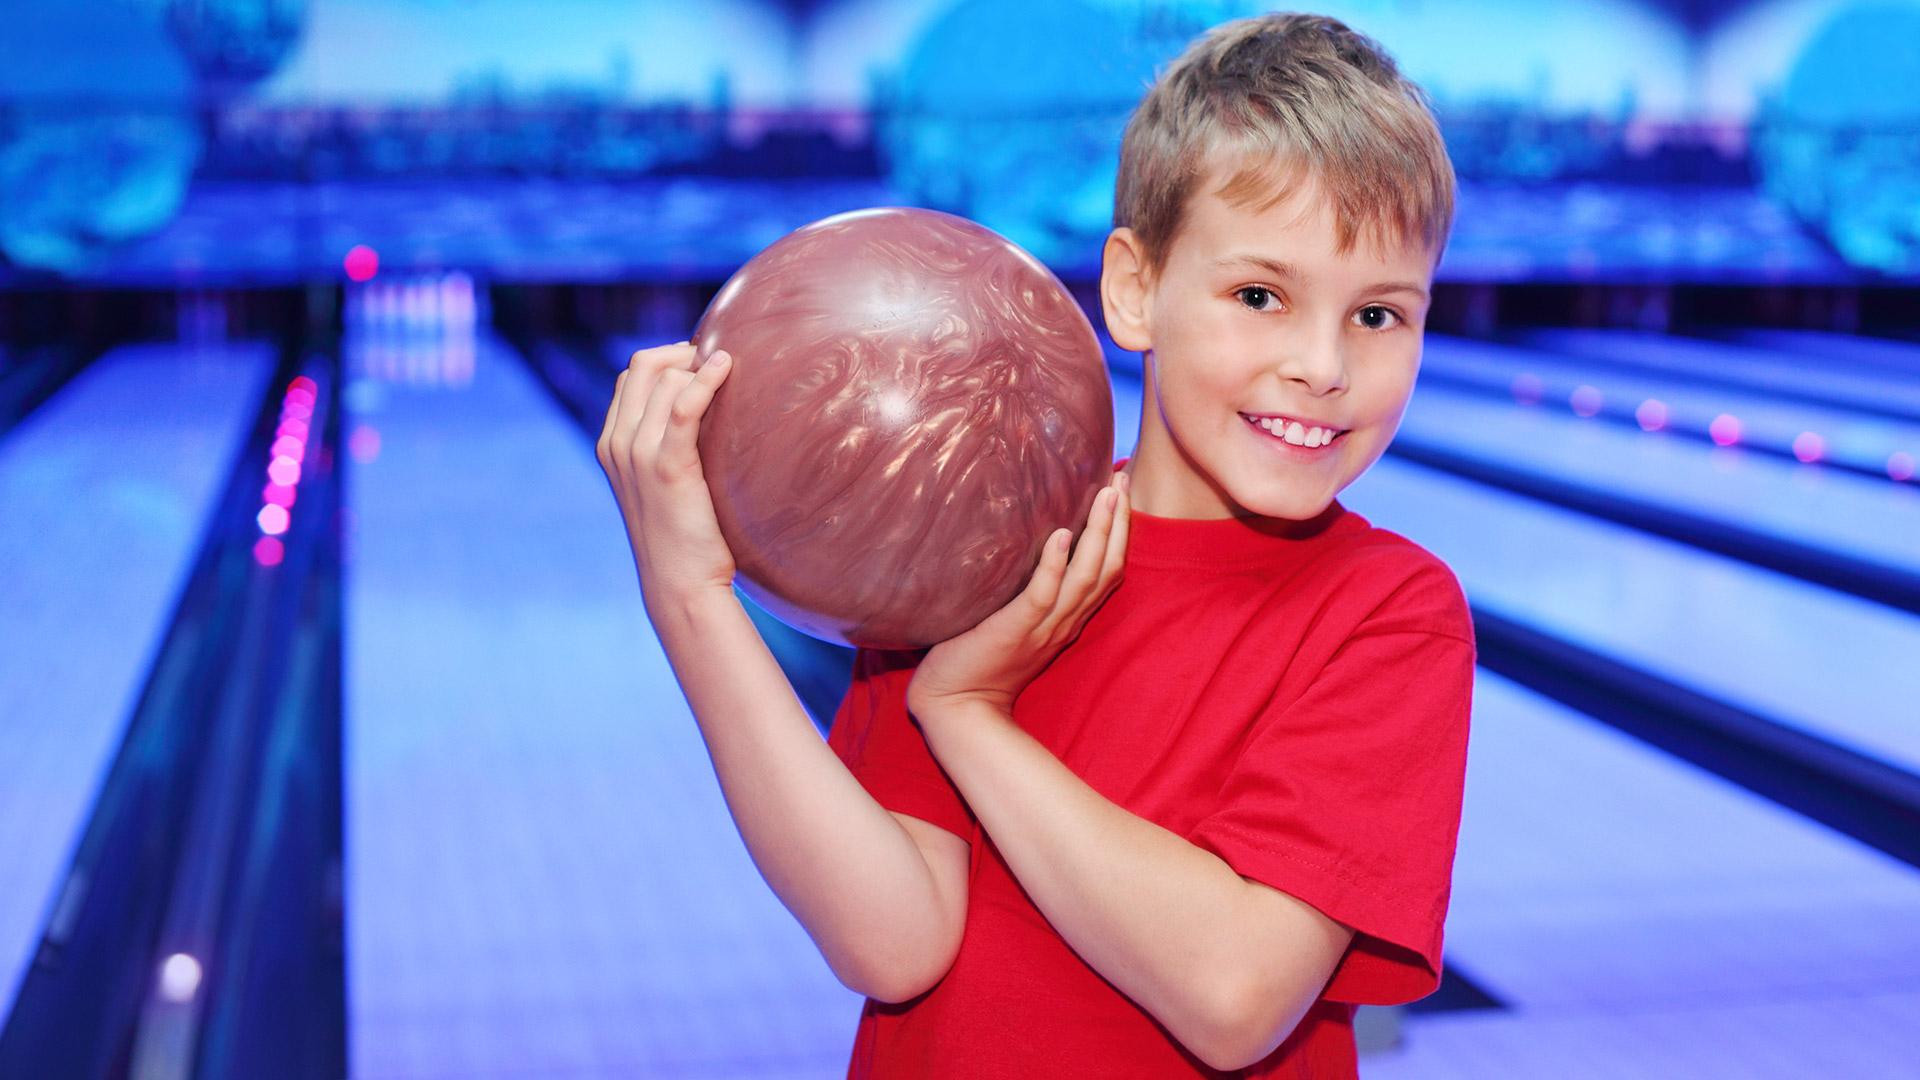 Kinderfeestje bowling